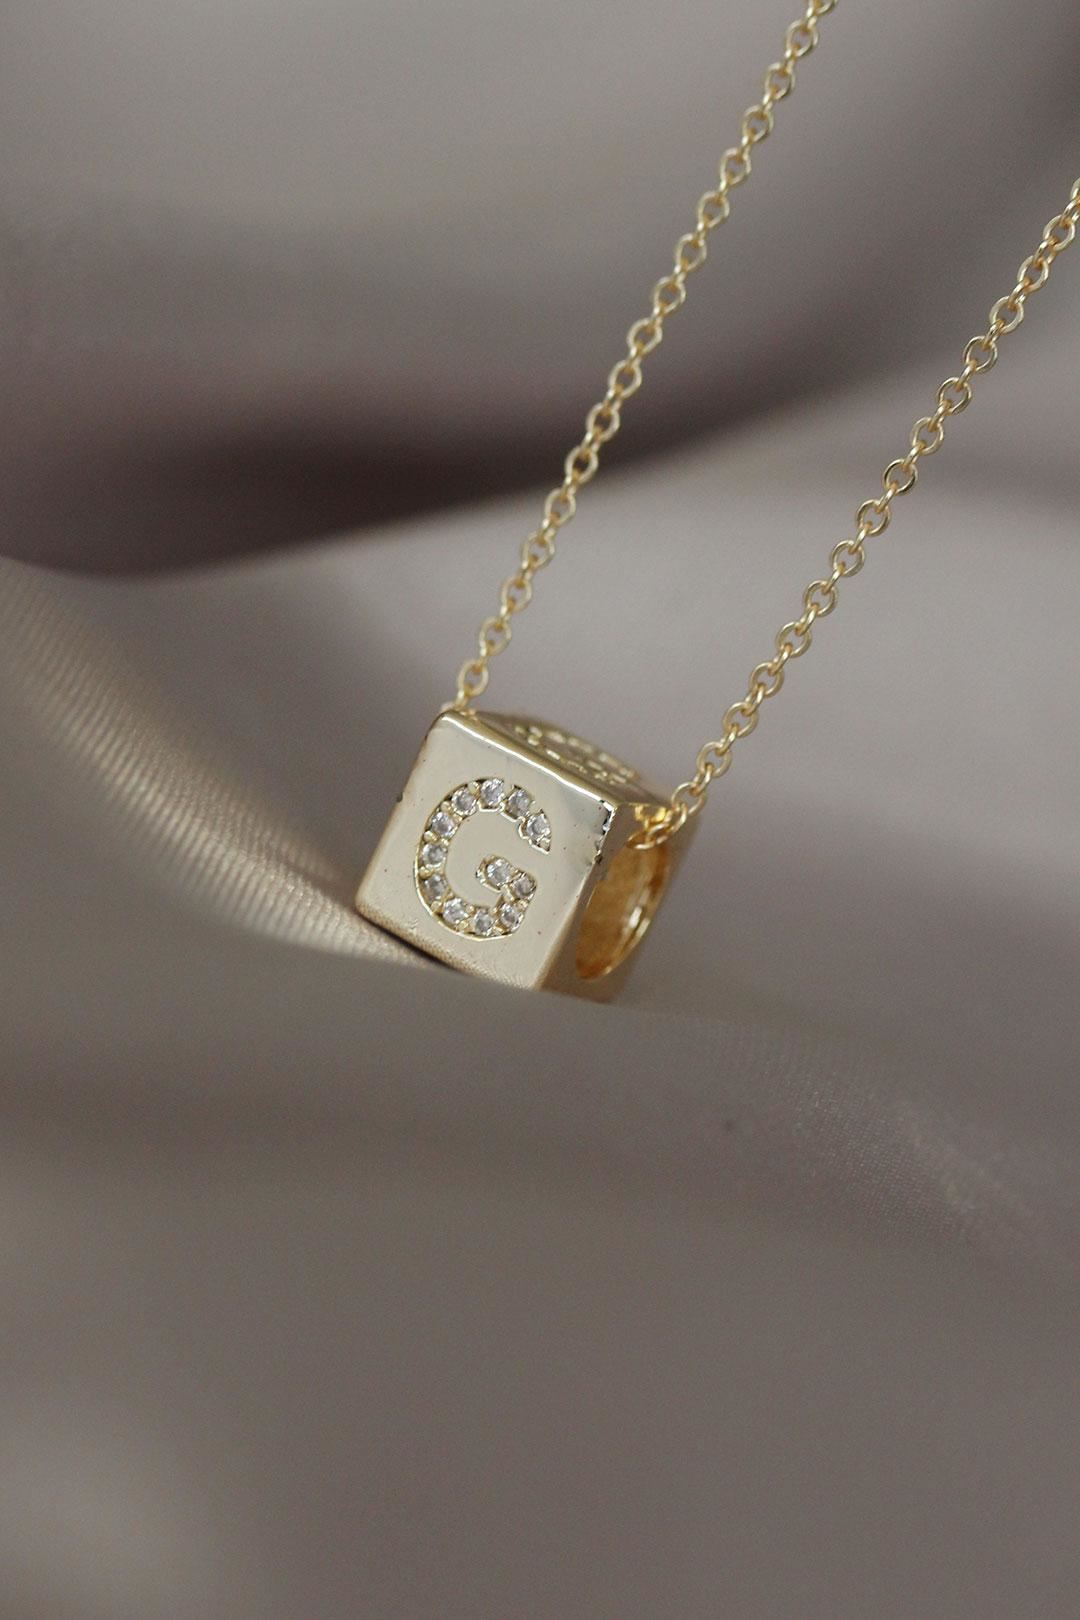 Gold Renkli Zirkon Taşlı Küp Model G Harfli Kolye